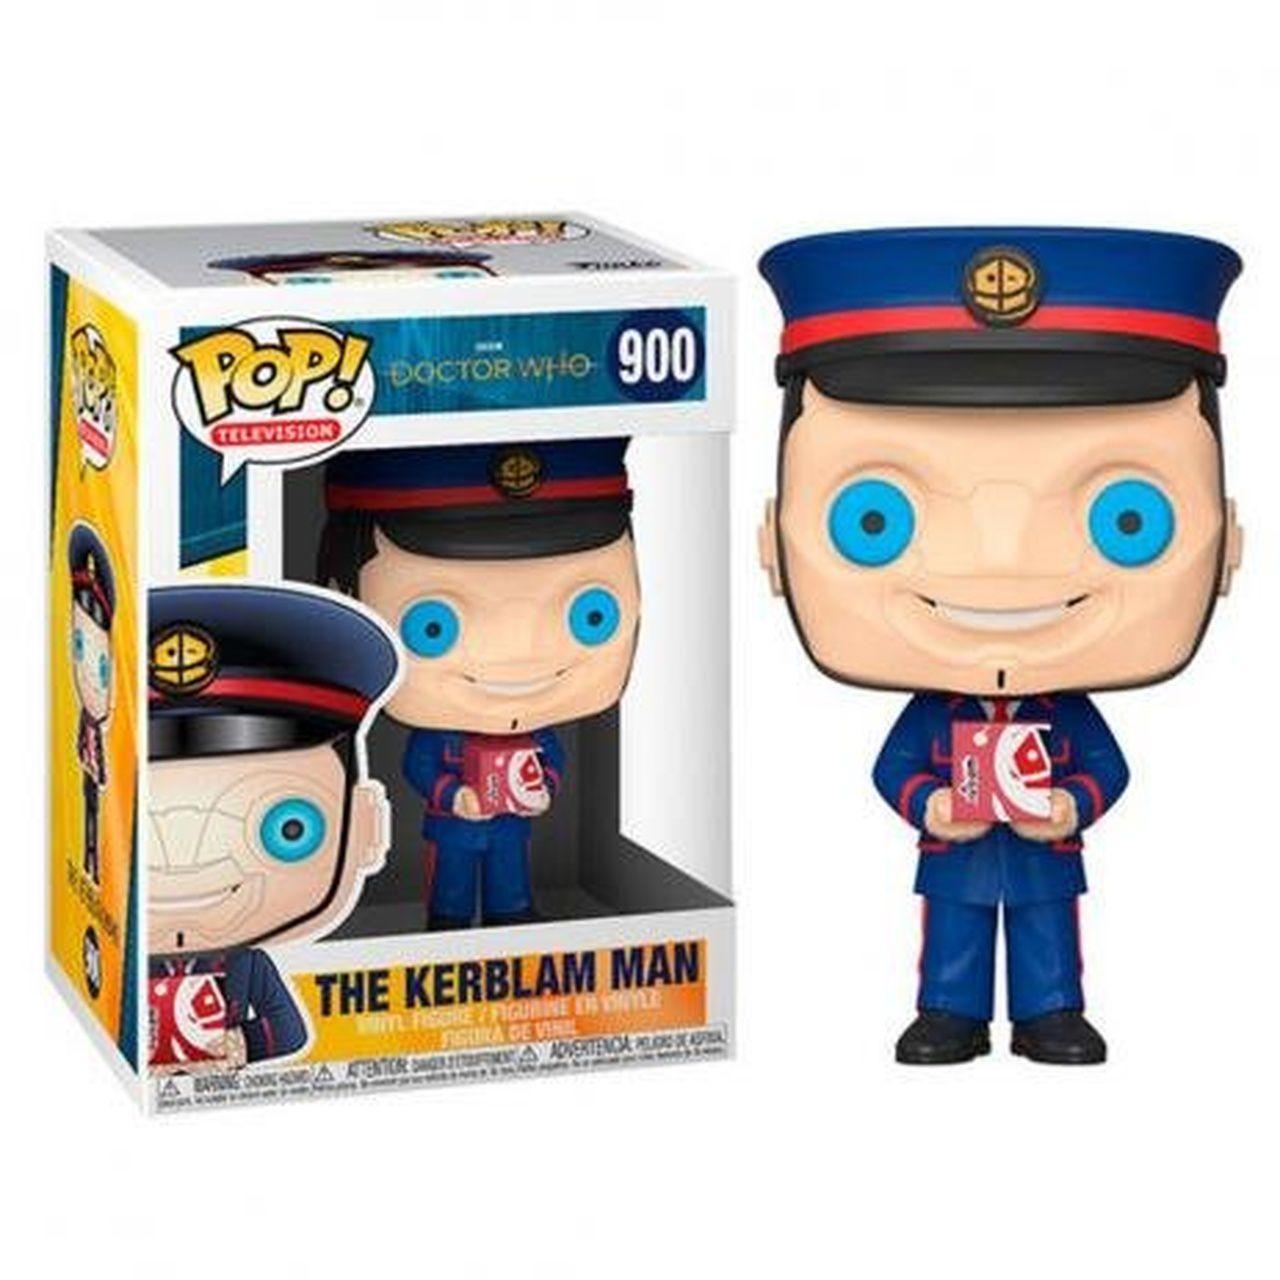 Funko Pop! The Kerblam Man: Doctor Who #900 - Funko